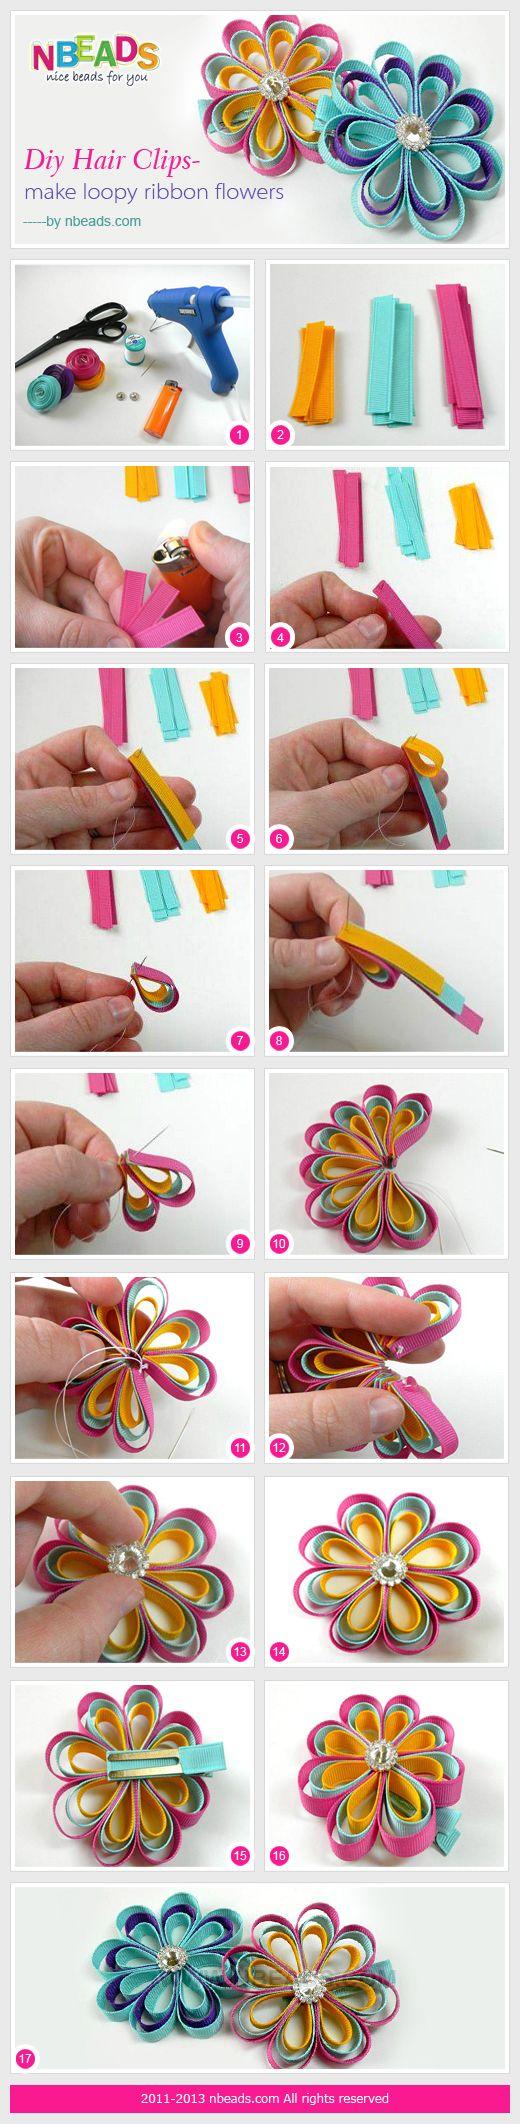 diy hair clips-make loopy ribbon flowers